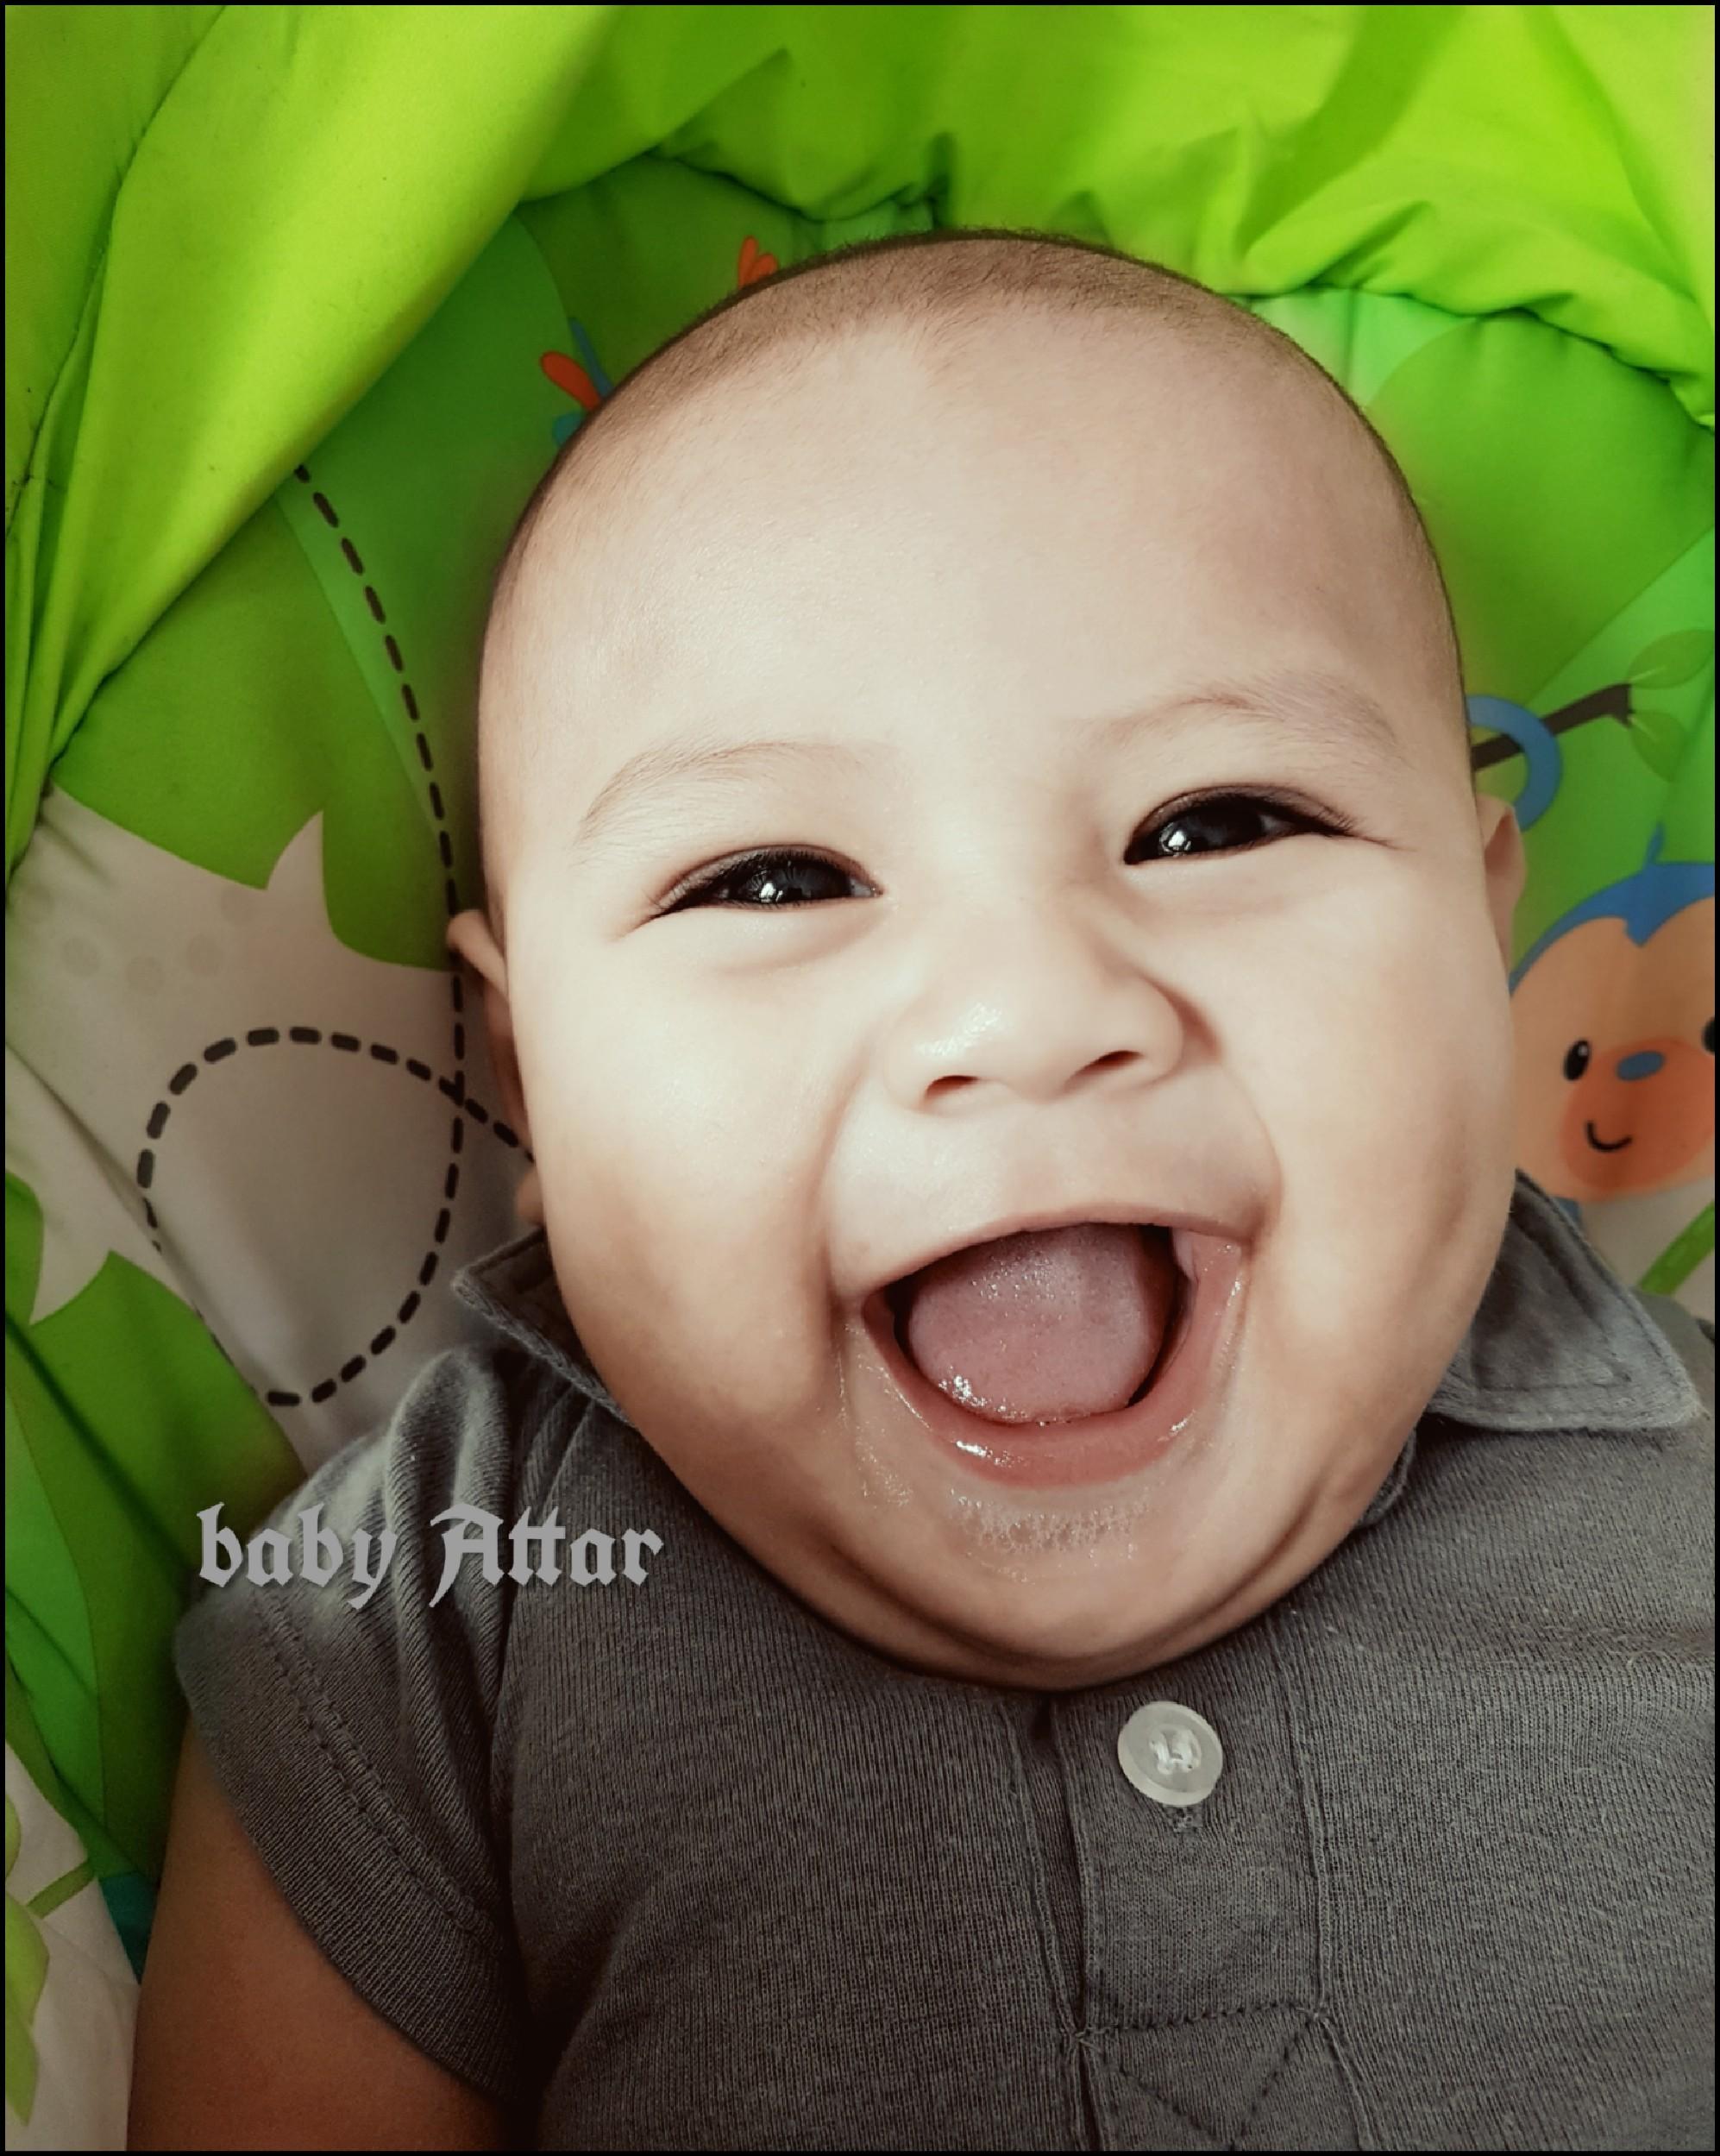 Babyattar Freetoedit Baby Babyboy Bayigemesin Bayilucu